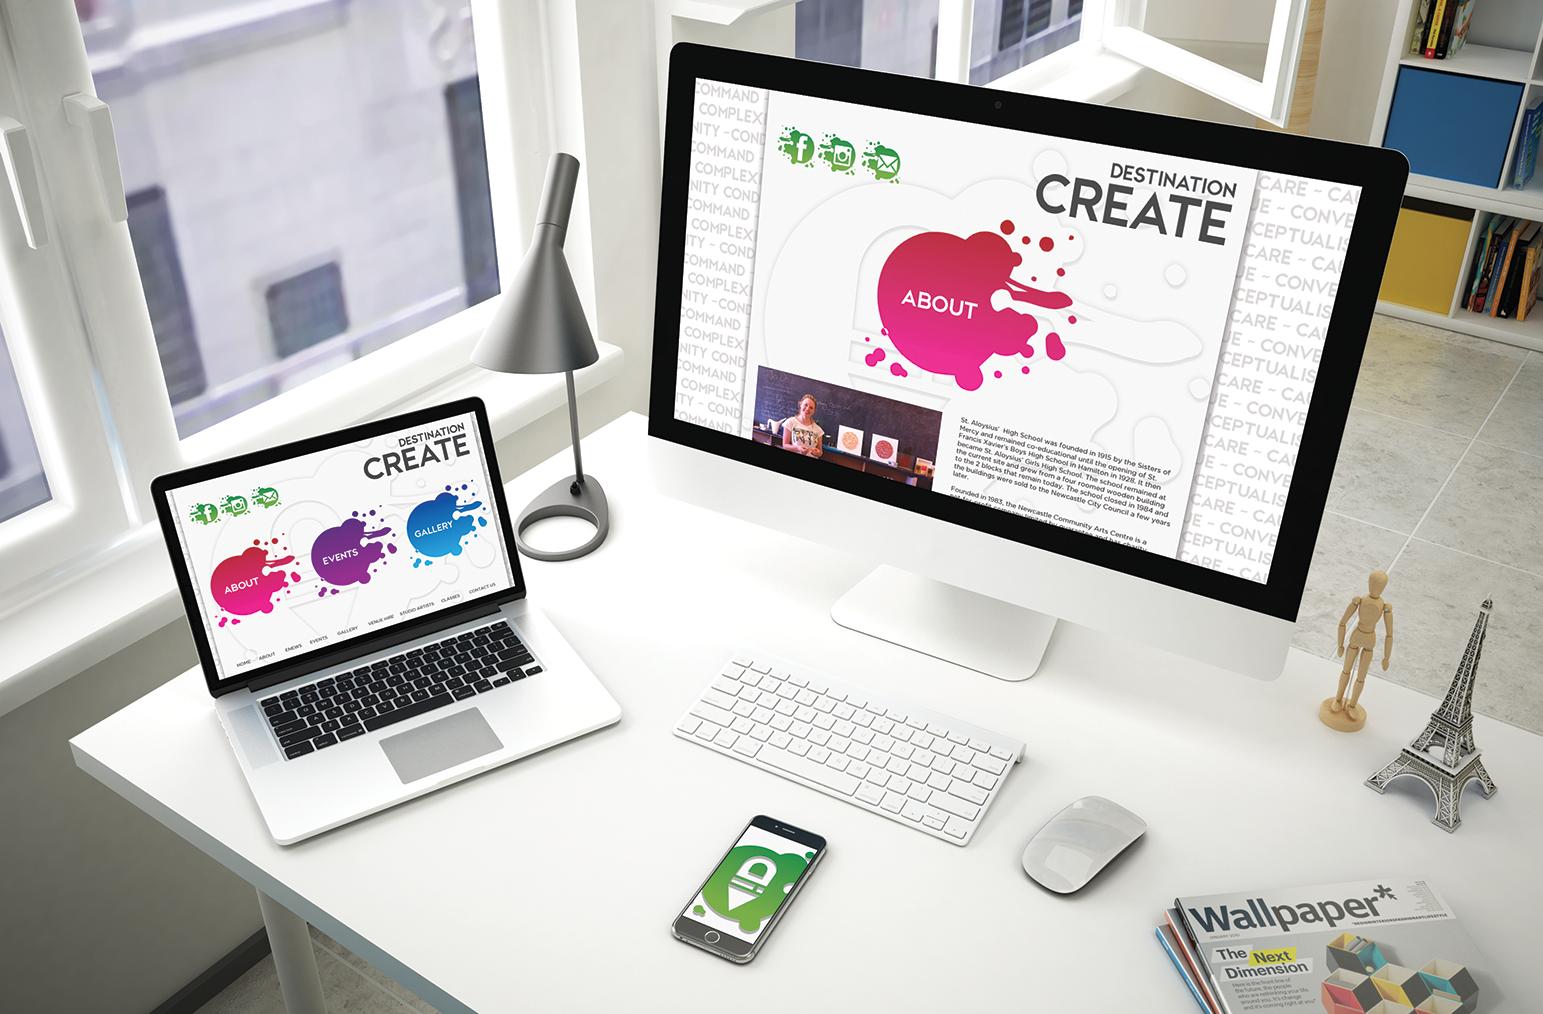 Destination Create web layouts